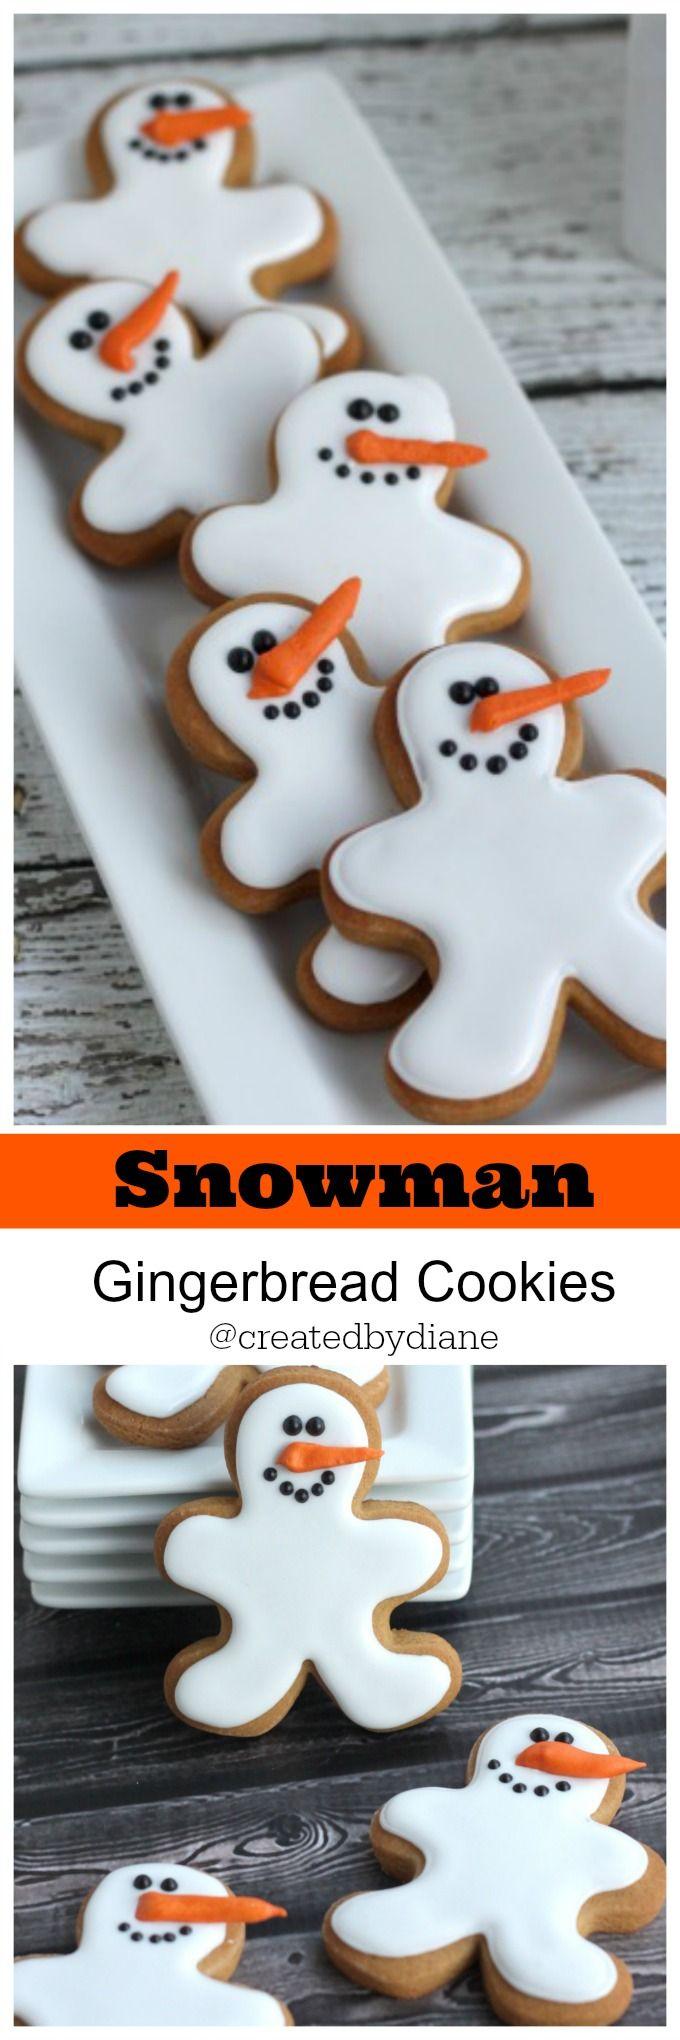 Snowman Gingerbread Cookies @createdbydiane